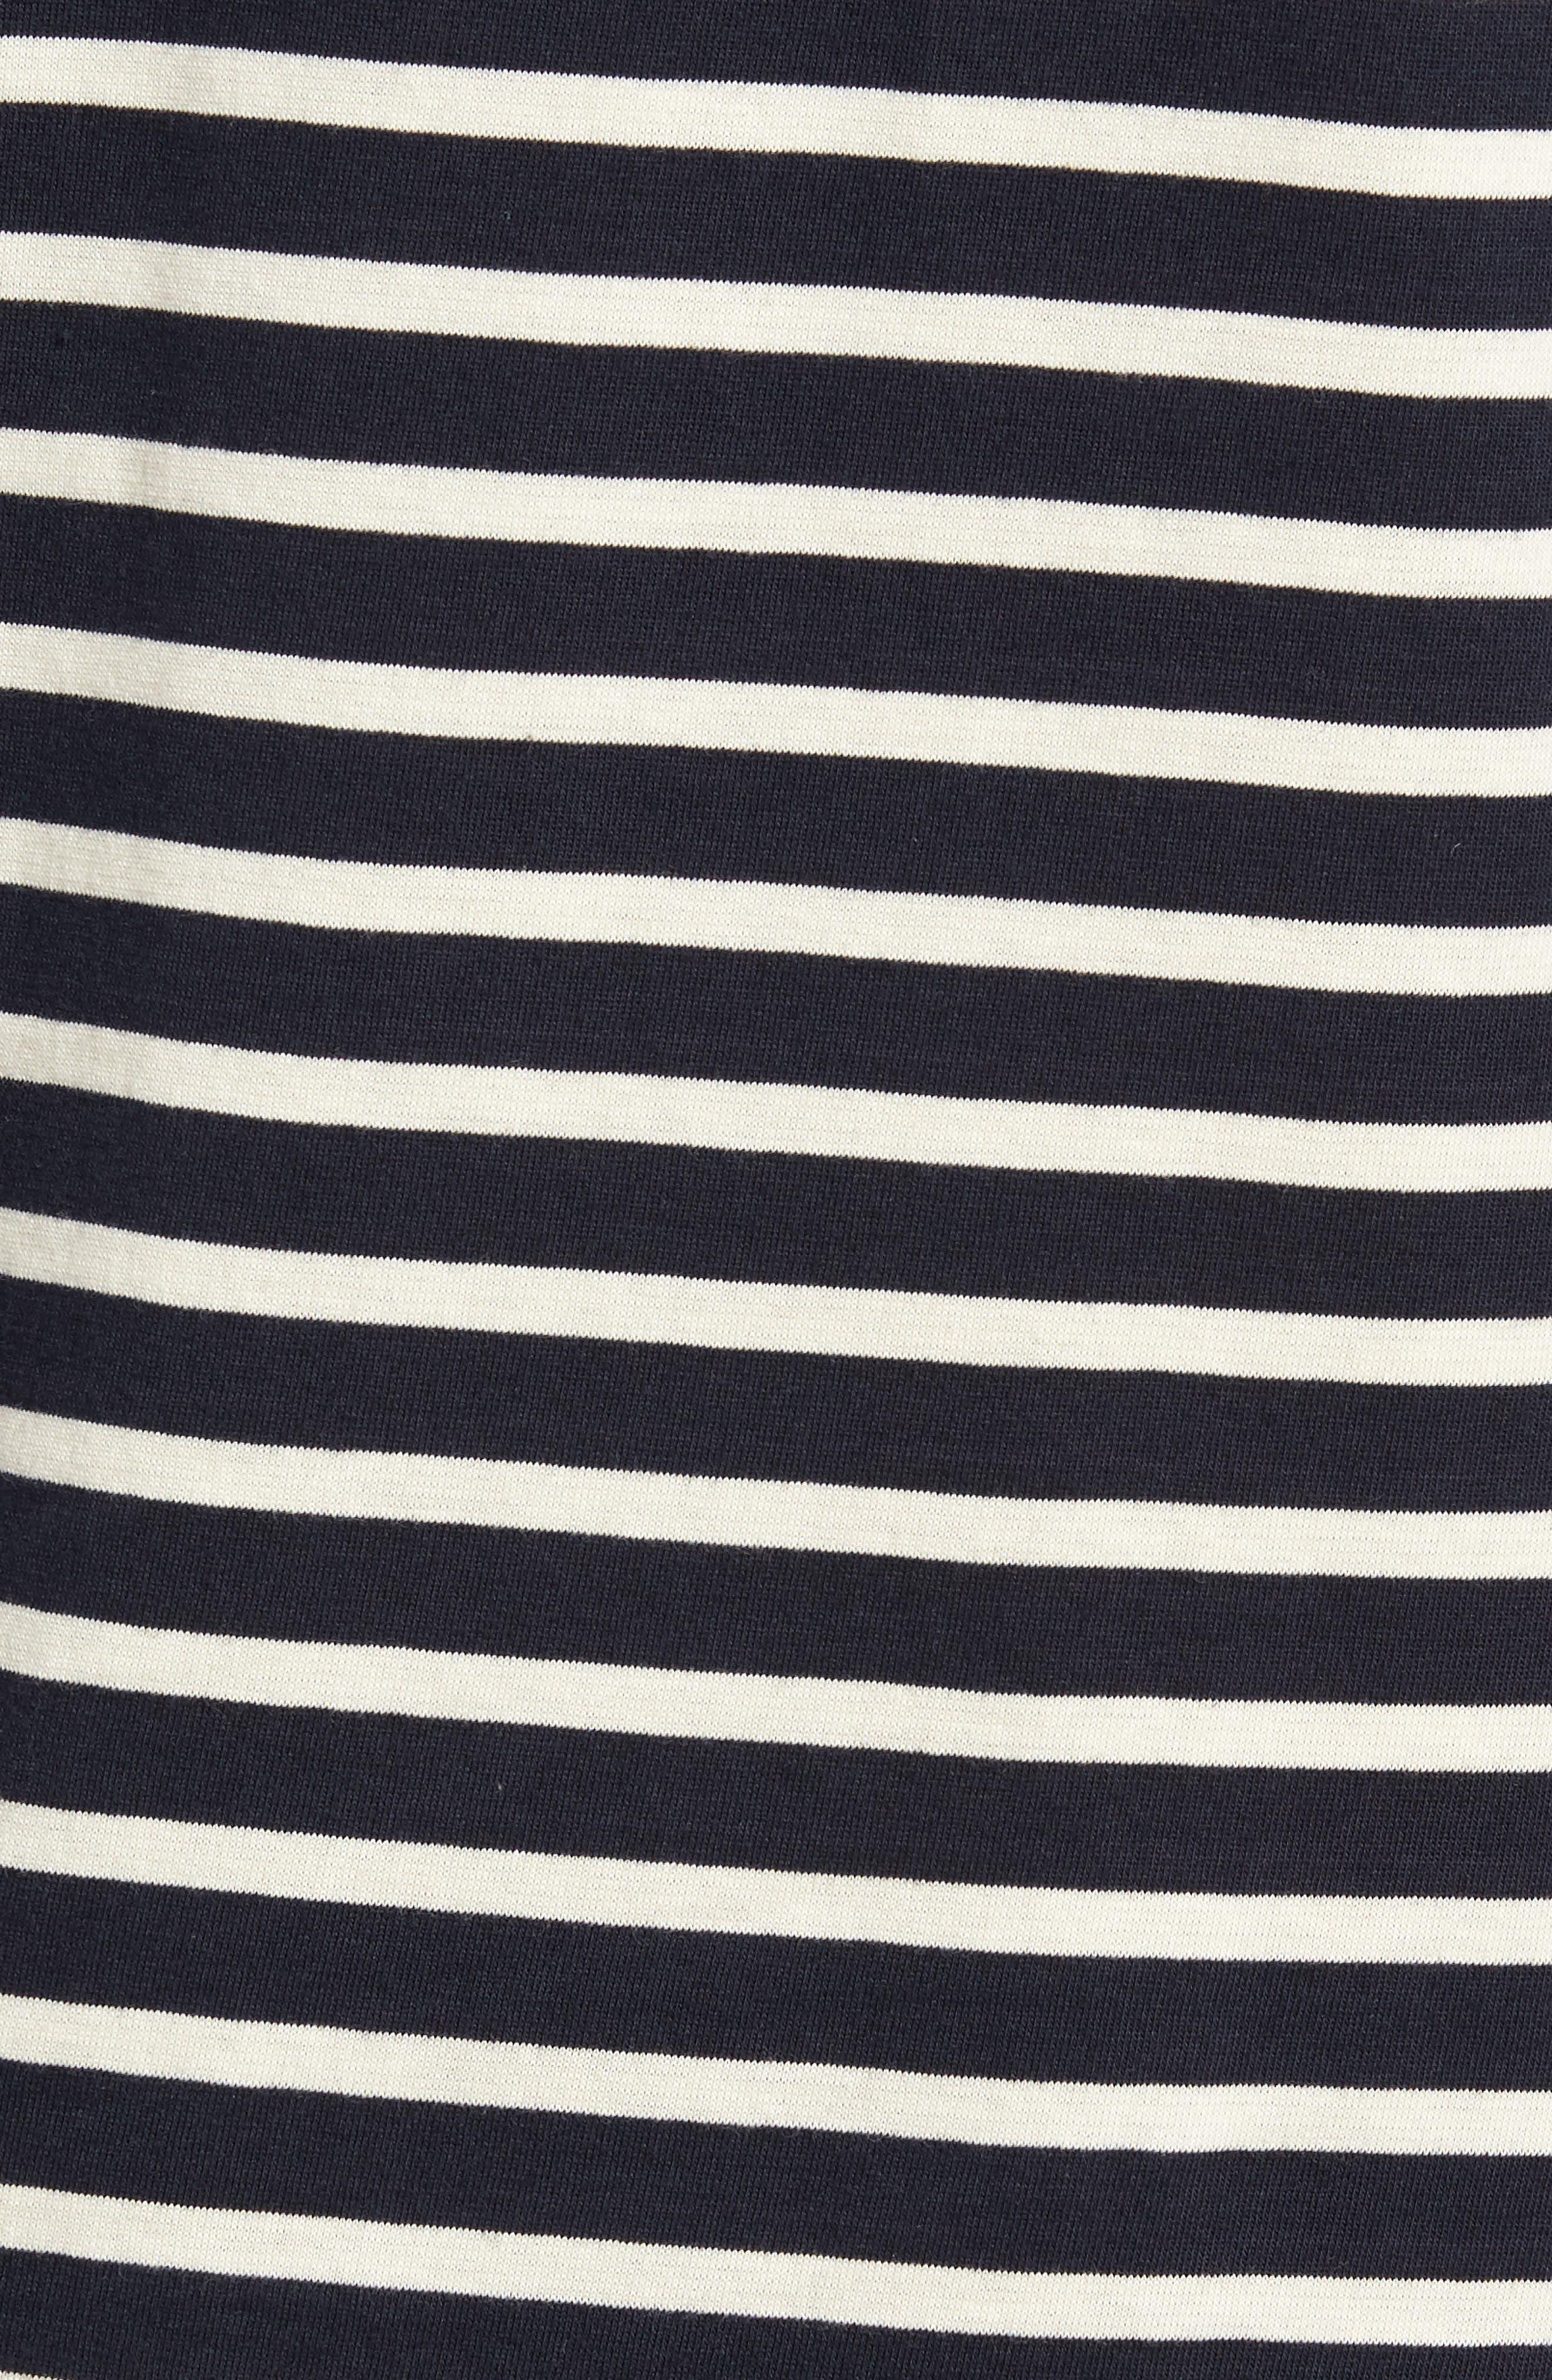 Mix Stripe Long Sleeve T-Shirt,                             Alternate thumbnail 5, color,                             020